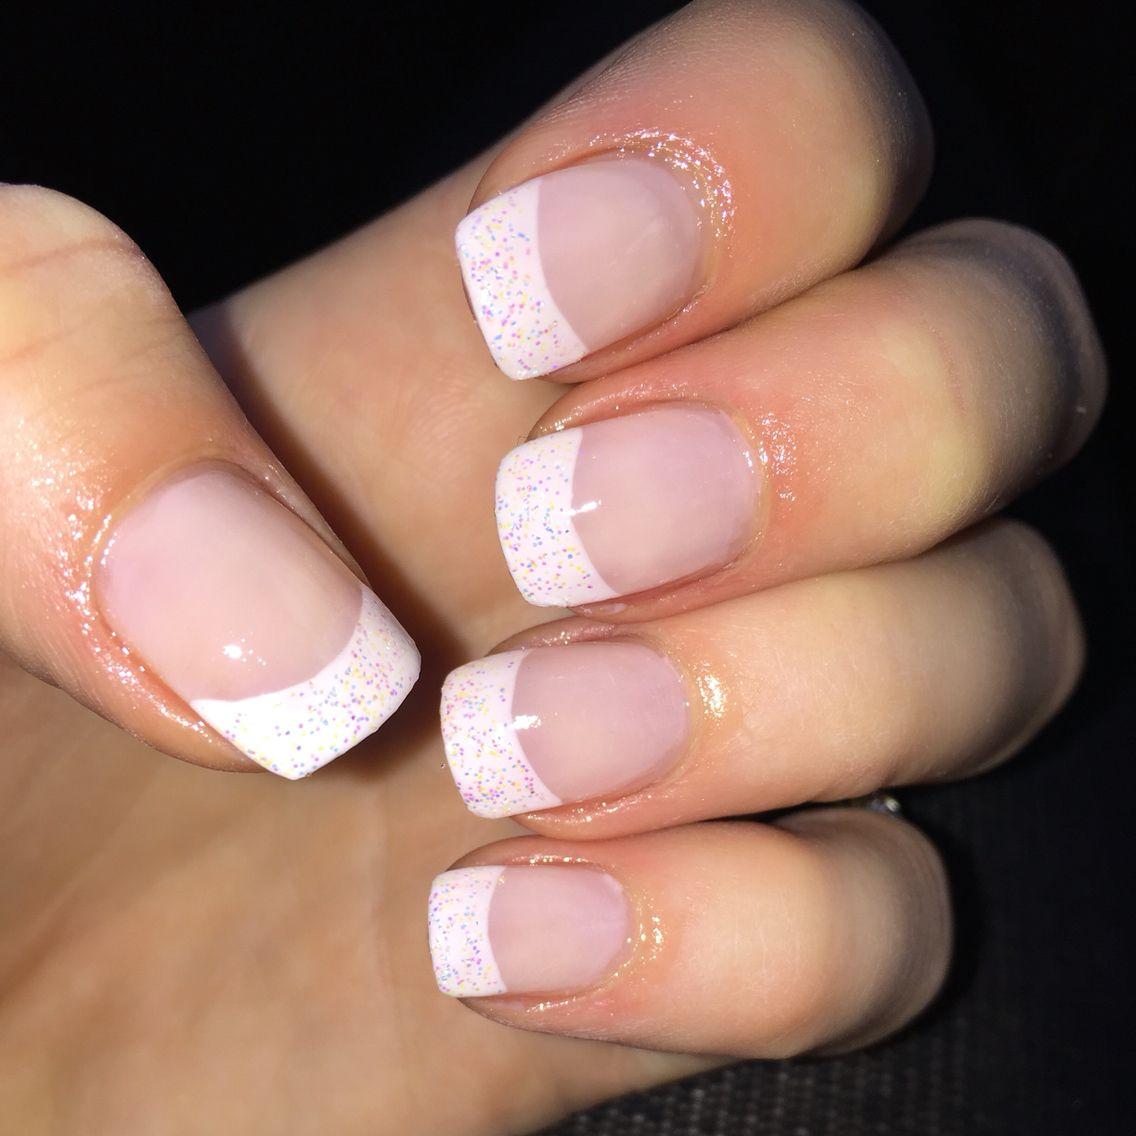 Glitter tip nails, French manicure, natural, nail design, nails ...